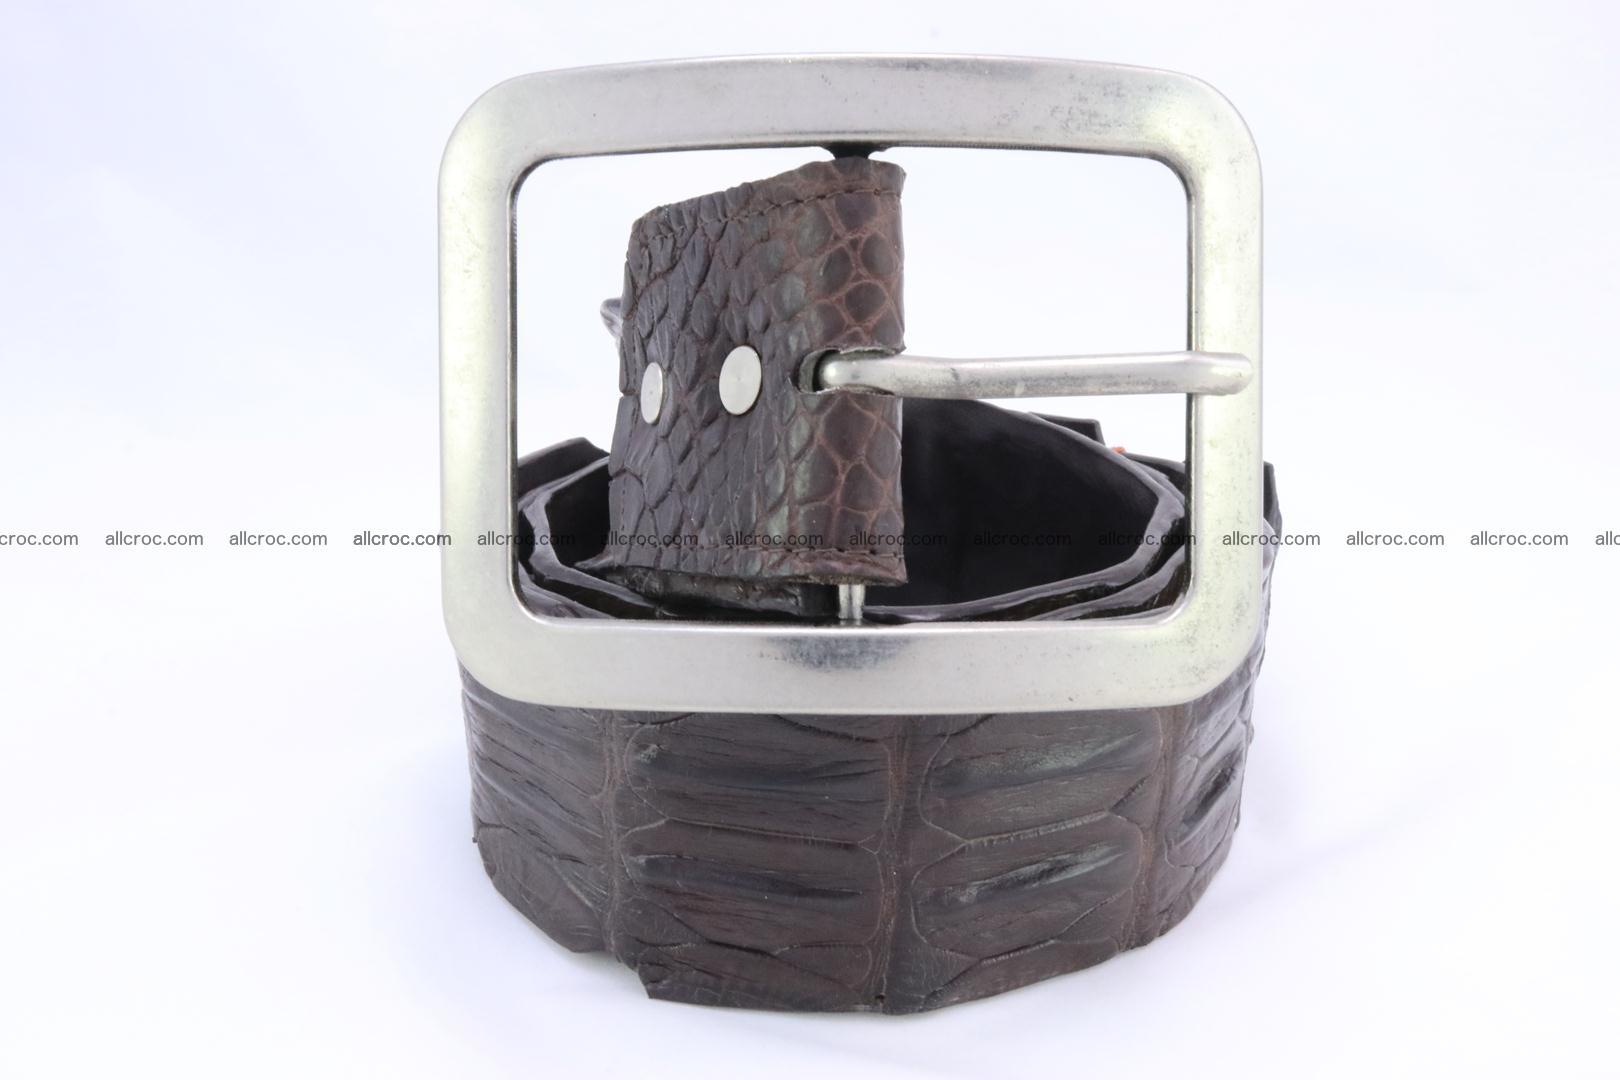 Genuine crocodile hornback belt for jeans width 50mm 155 Foto 2